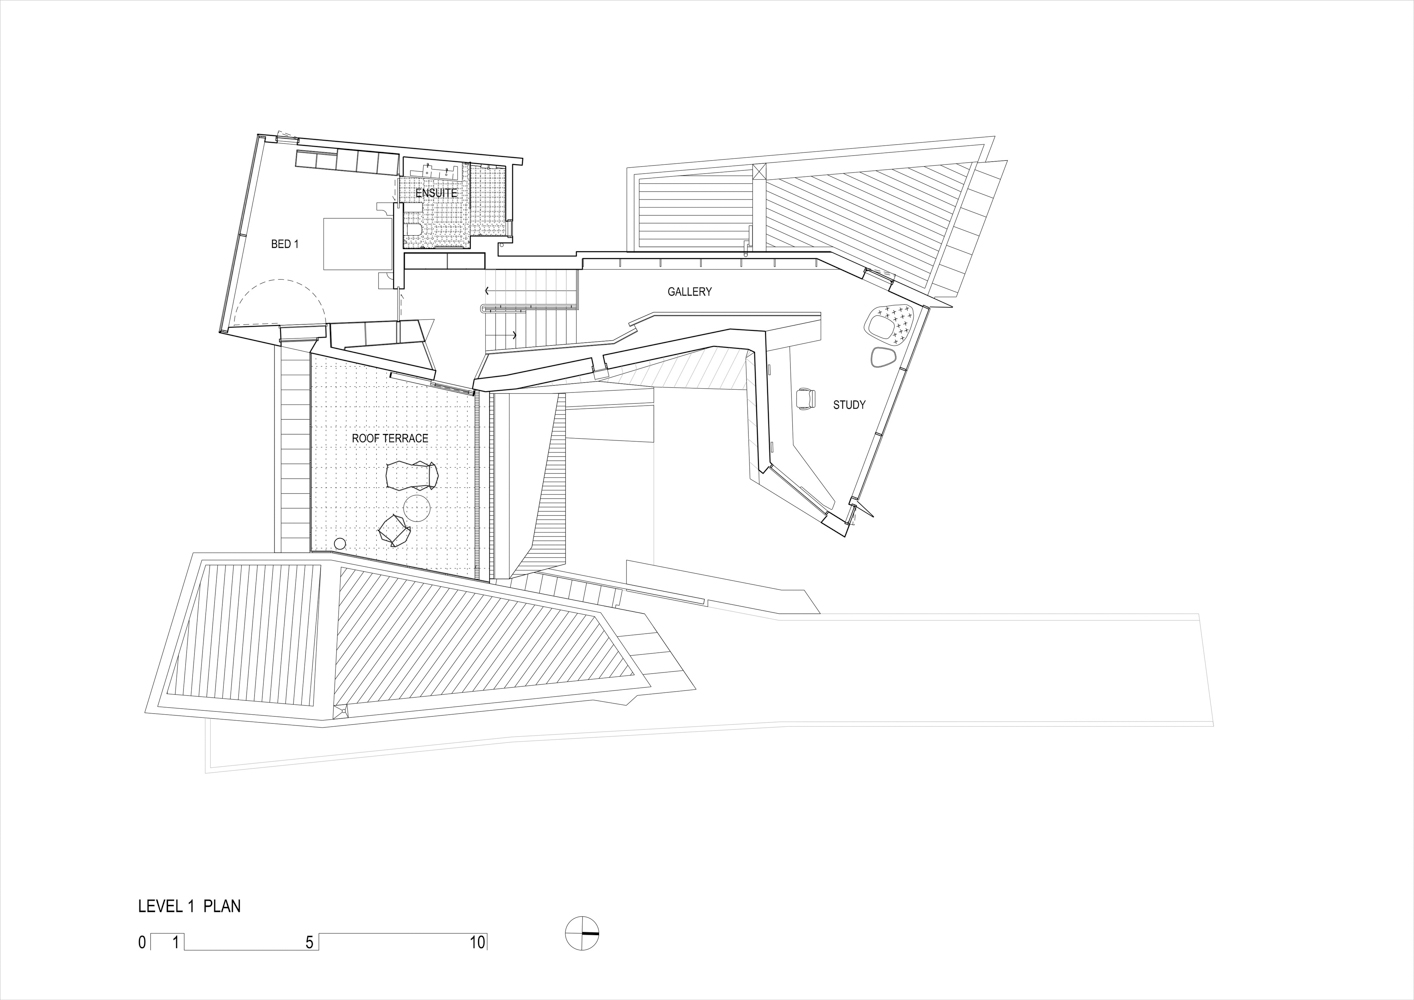 fairhaven-beach-house-john-wardle-architects-the-design-emotive-10.jpg